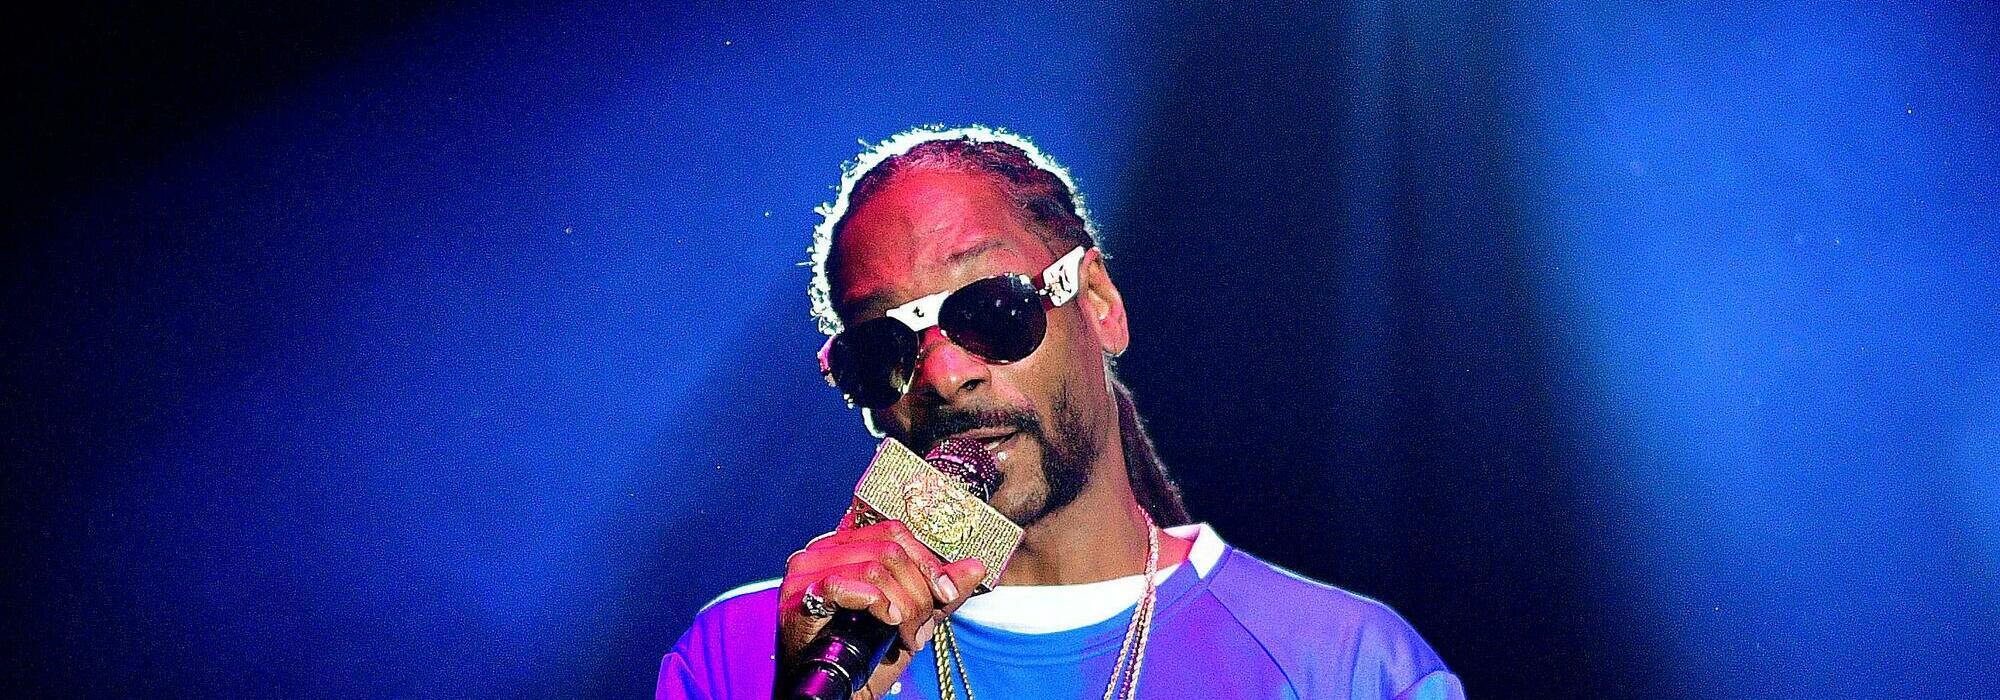 A Snoop Dogg live event